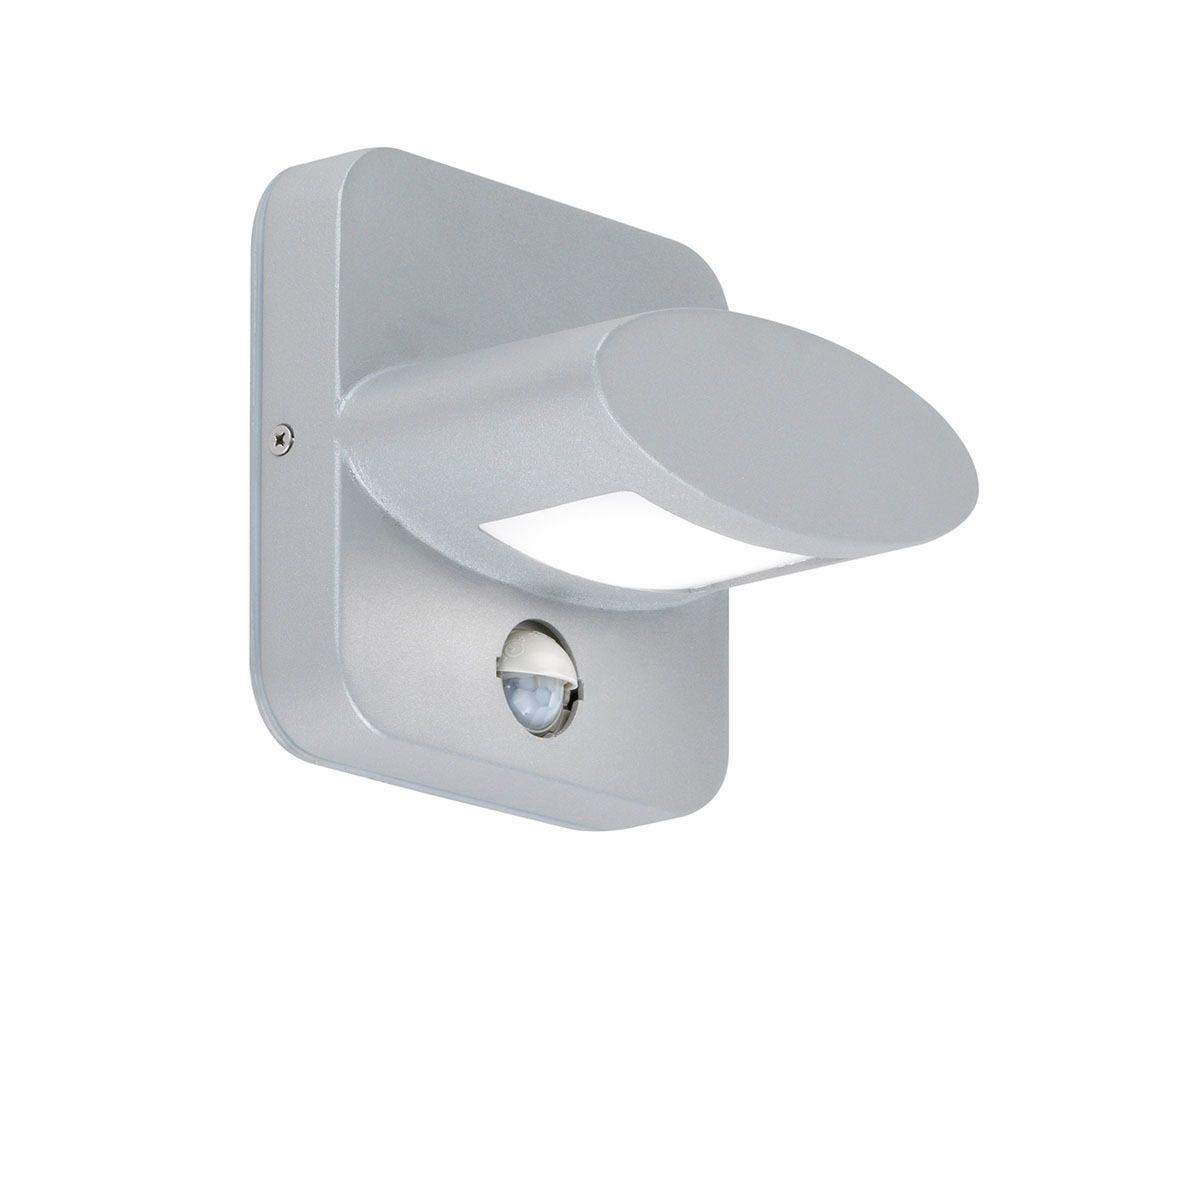 Wofi Altana LED Wall Lamp - Grey